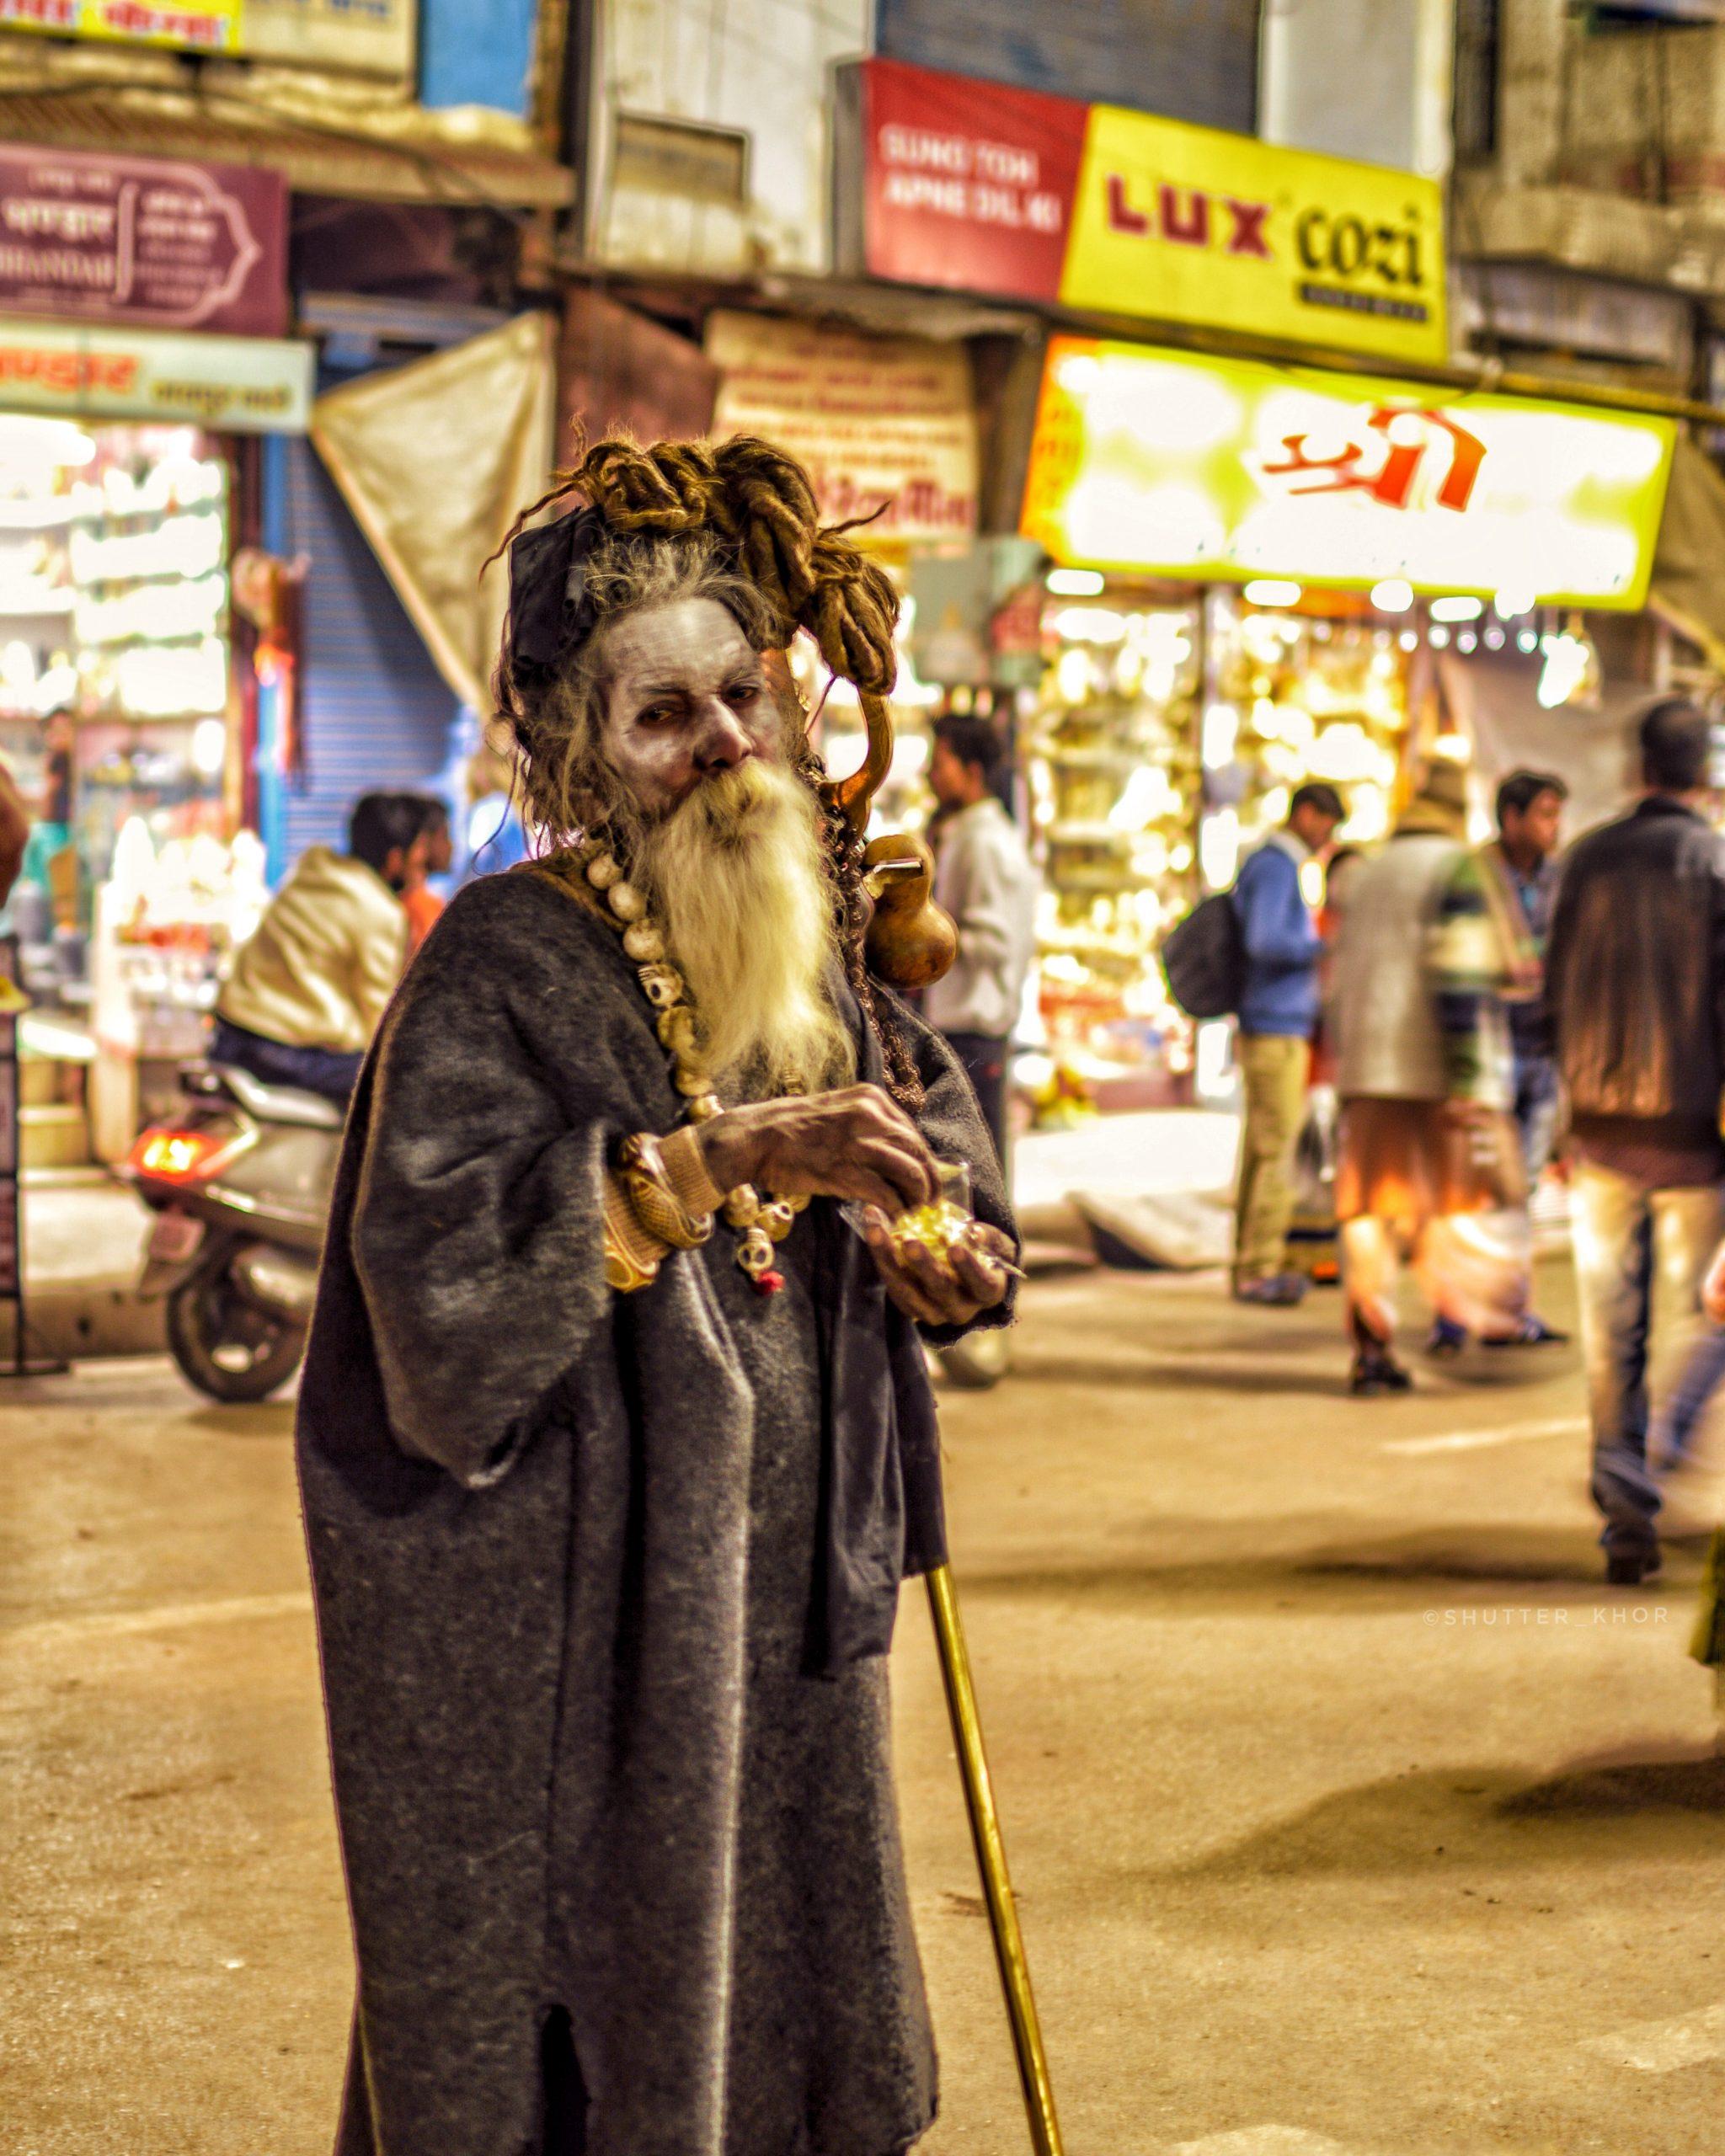 A Sadhu standing on a street